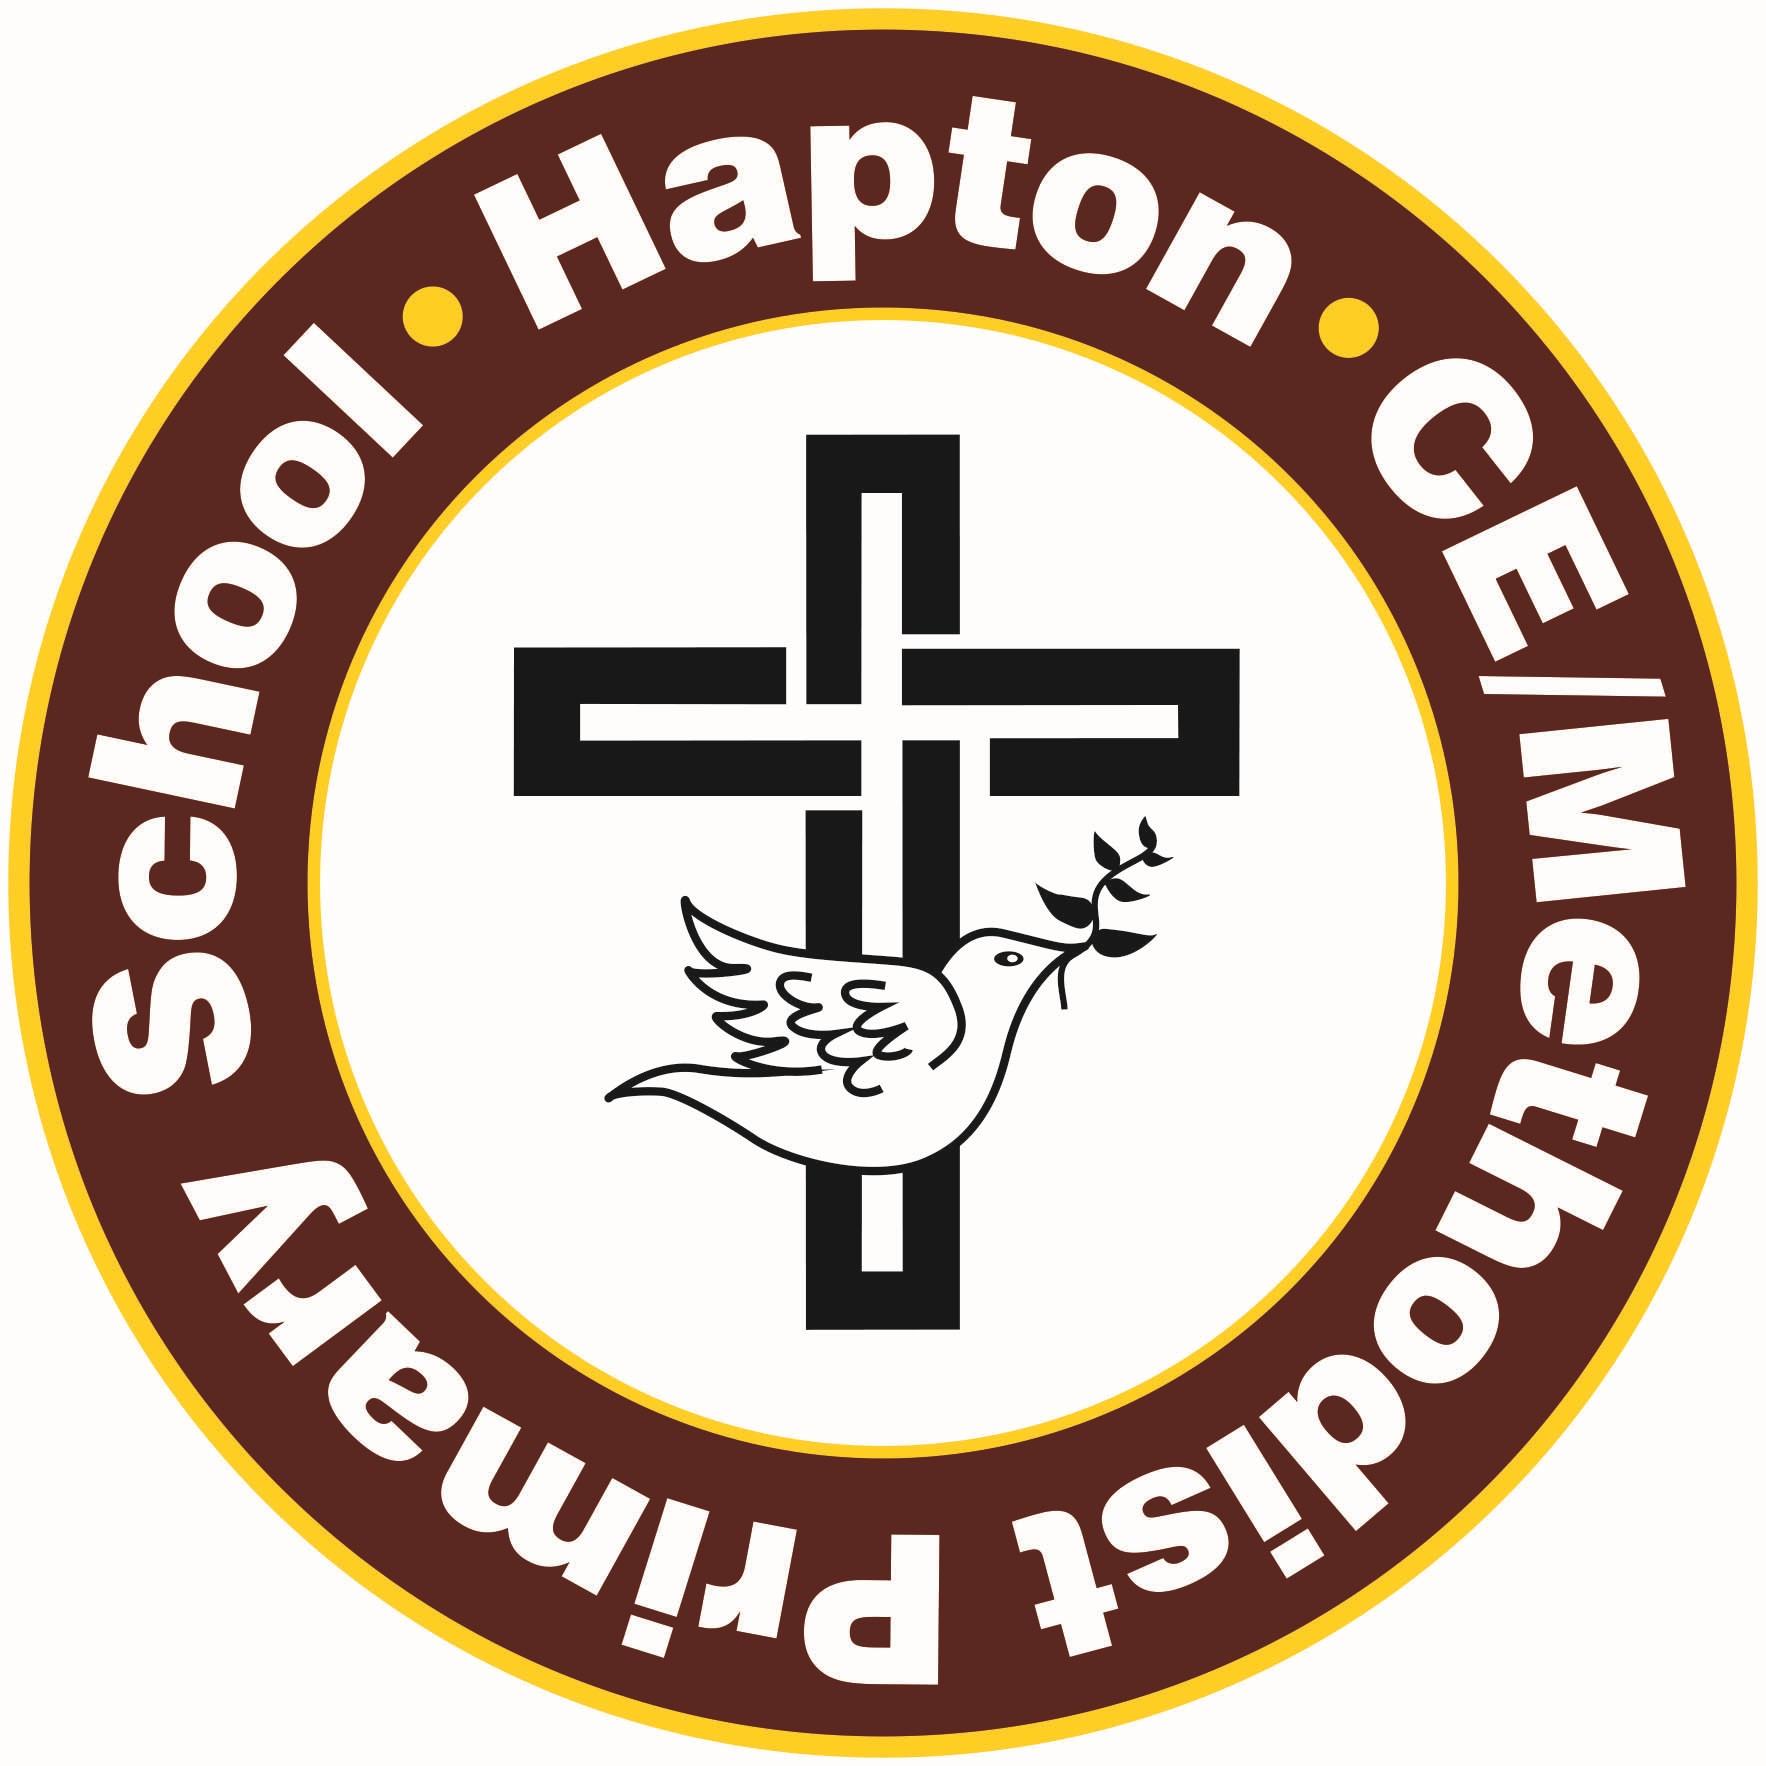 Hapton Church Of England/Methodist Primary School | Manchester Road, Burnley BB11 5RF | +44 1282 771657